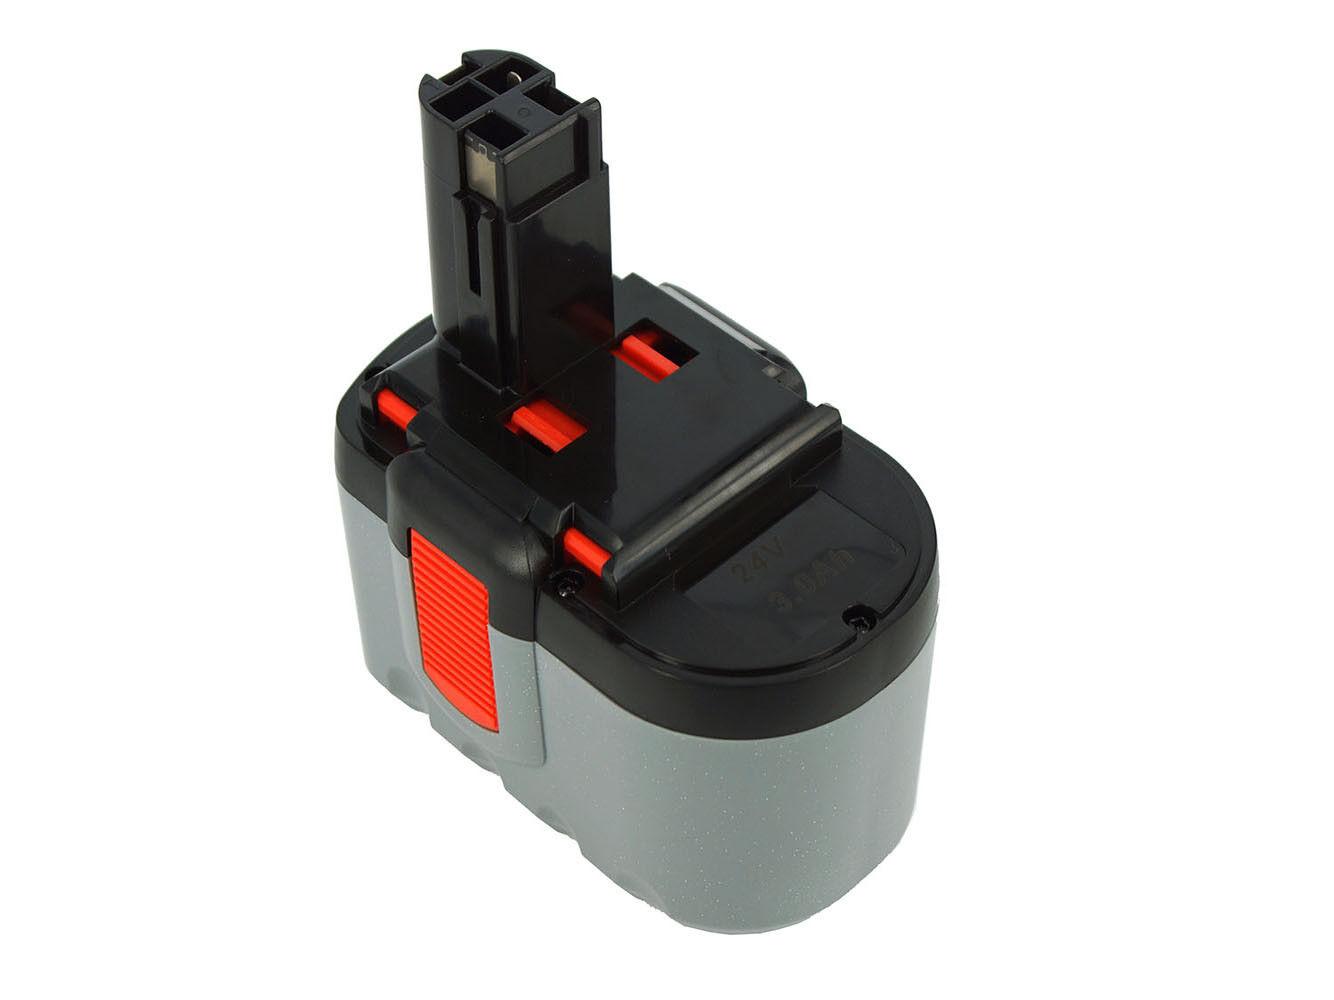 Akku für Bosch GSA 24 VEF,GSR 24 VE-2,GST 24 VH,2 607 335 562, NiMH 24V 3000mAh